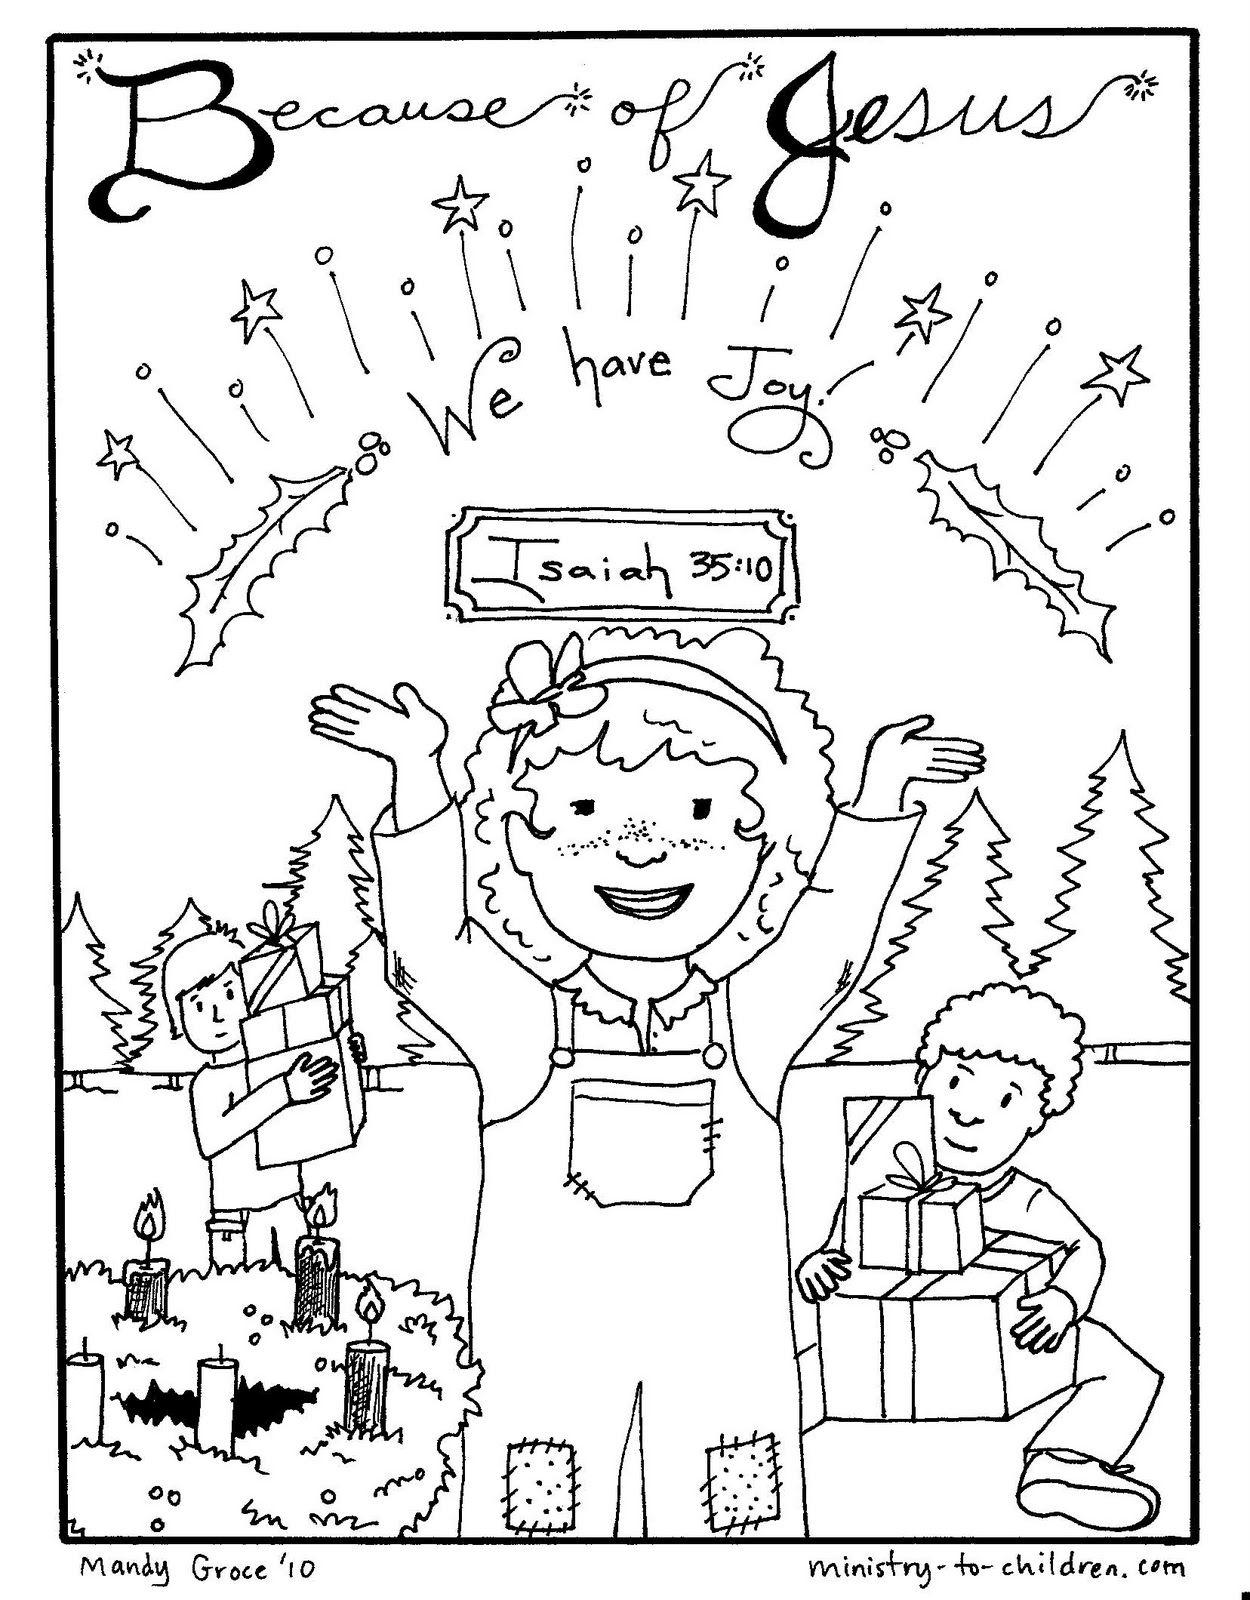 advent coloring pages | advent-coloring-pages-joy.jpg | Sunday ...